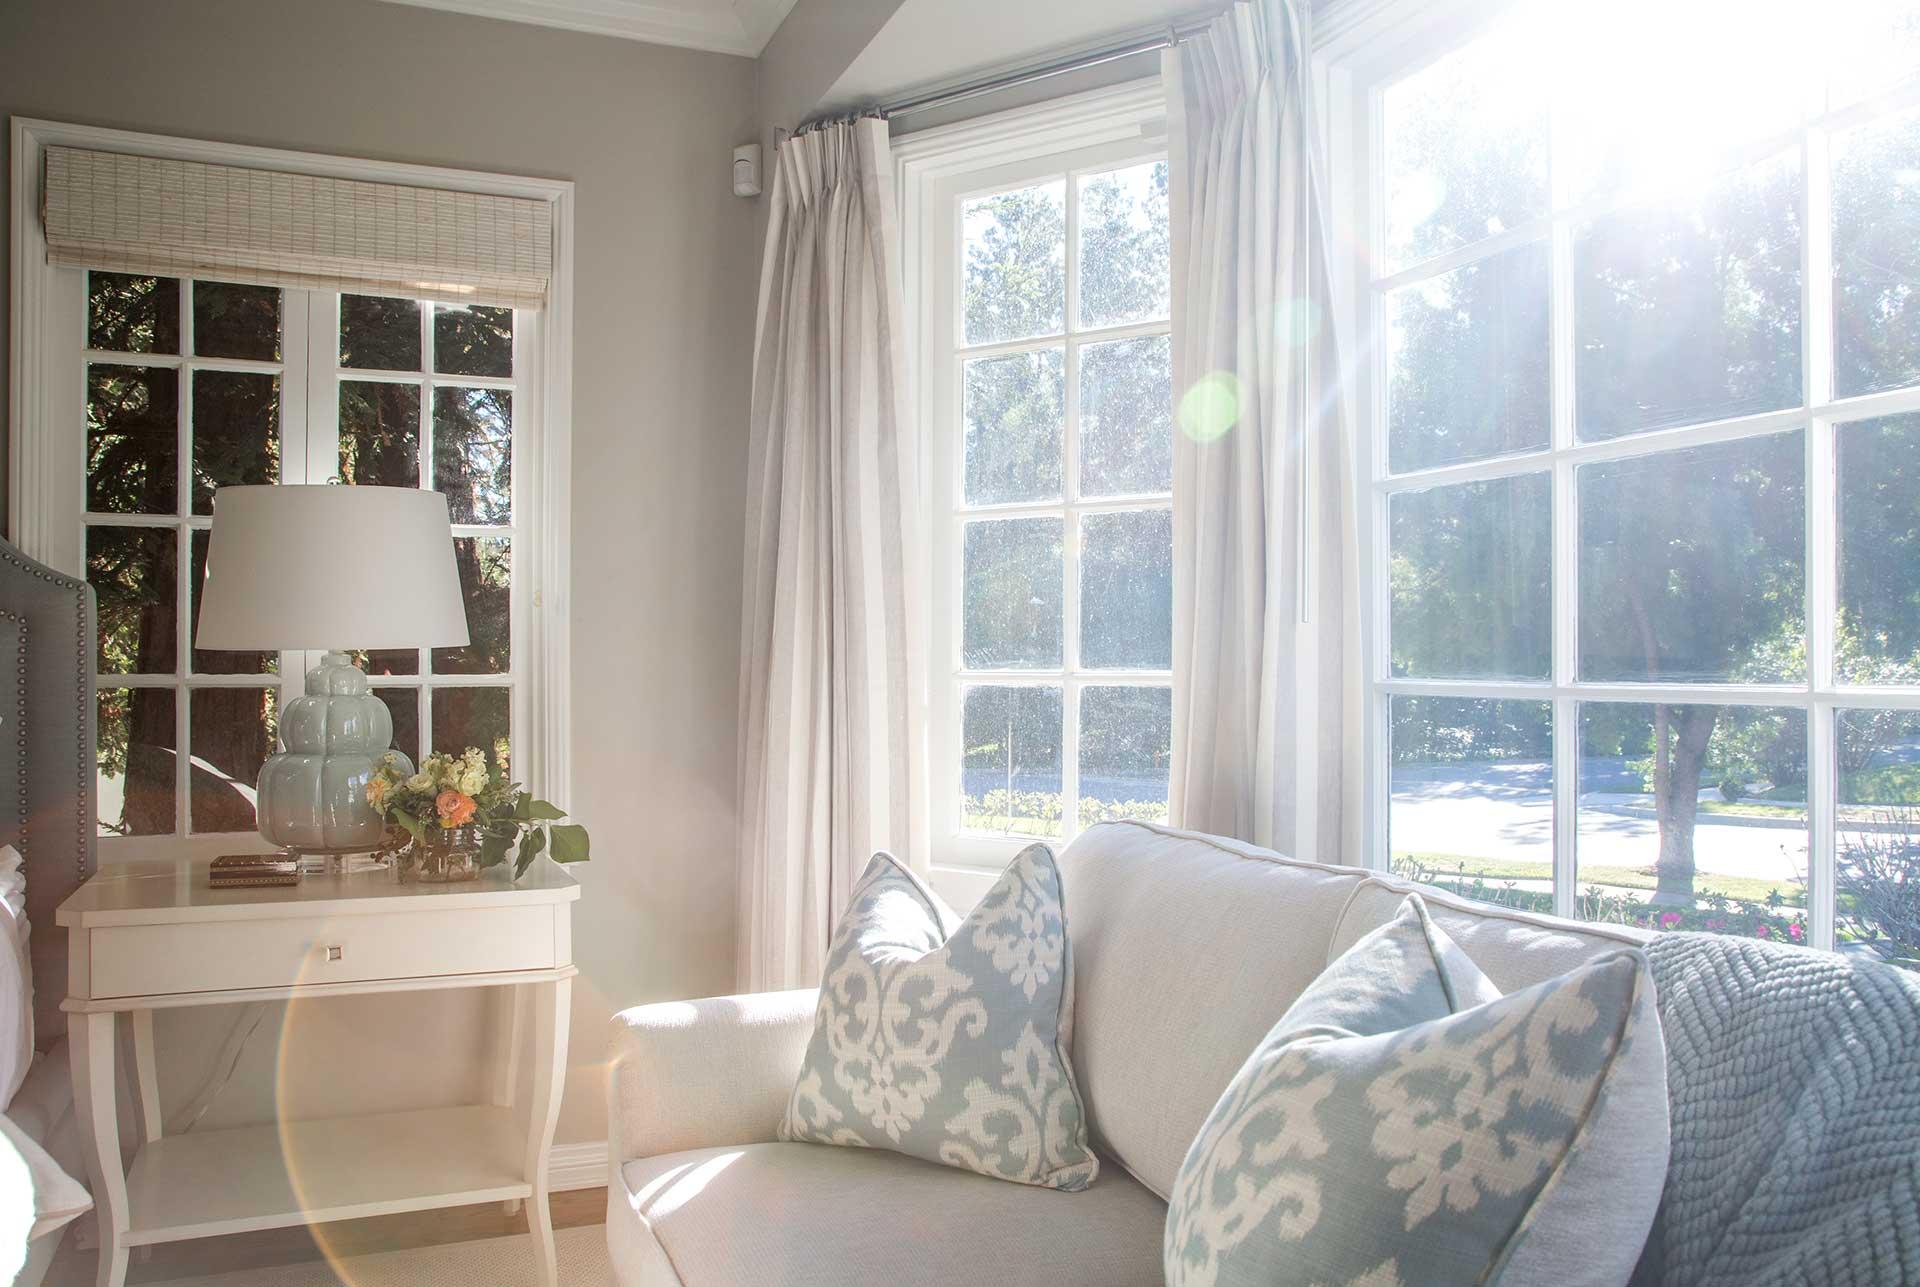 San marino master suite remodel peltier interiors for The family room san marino